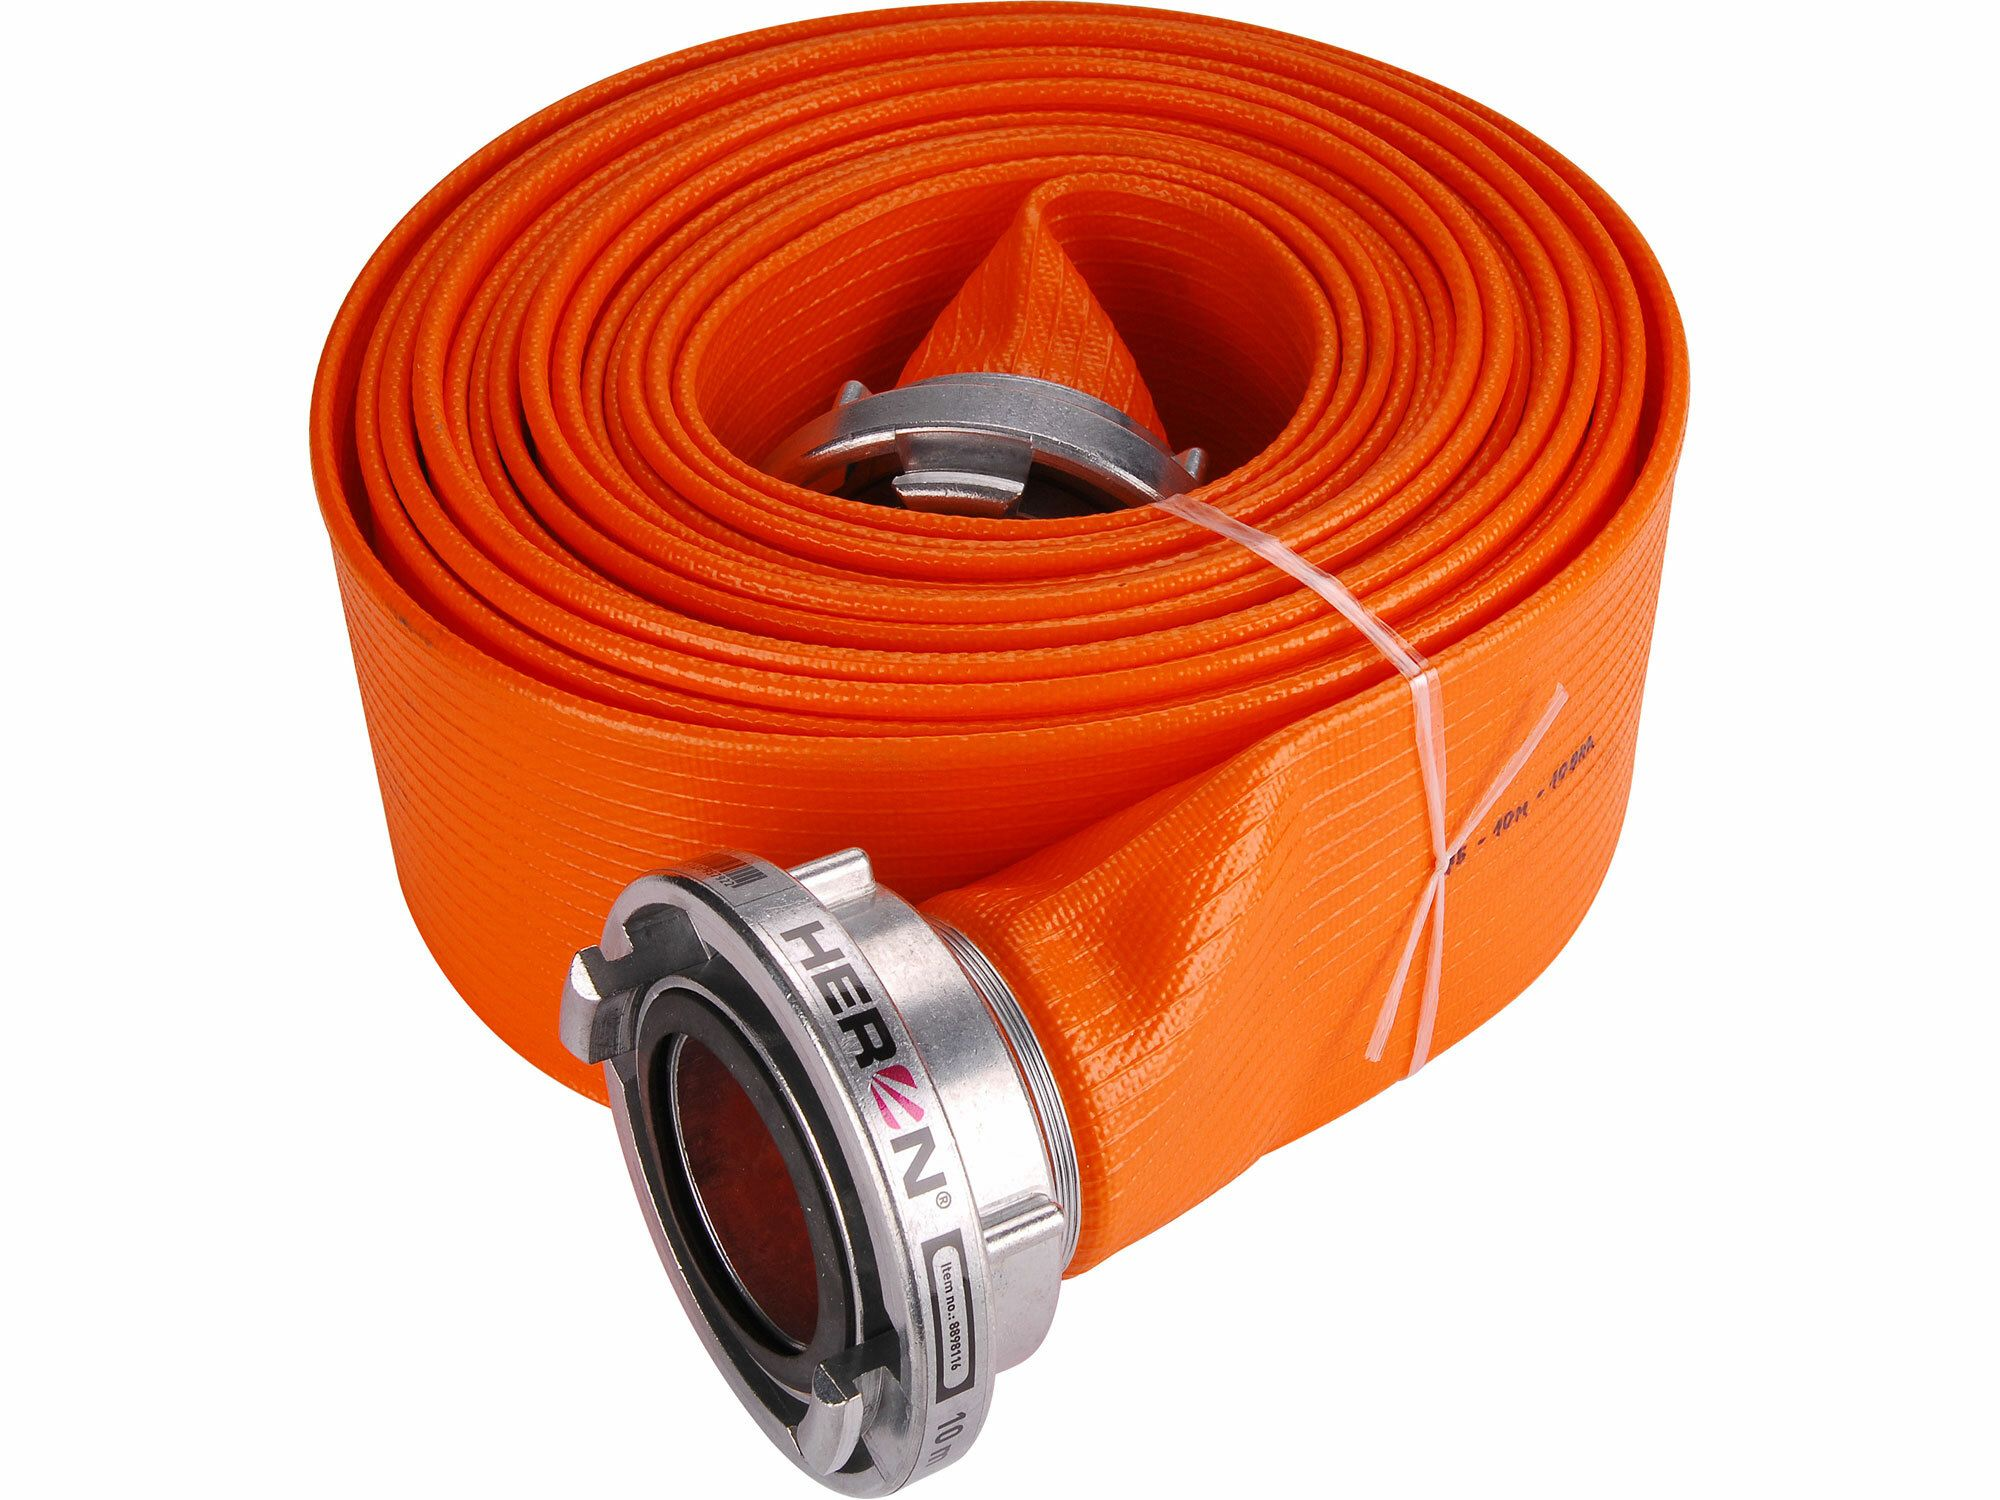 "Hadice B75 PVC Orange 10m se spojkami, 3"", 10m, pro 8895106, 8895105, 8895102 HERON"